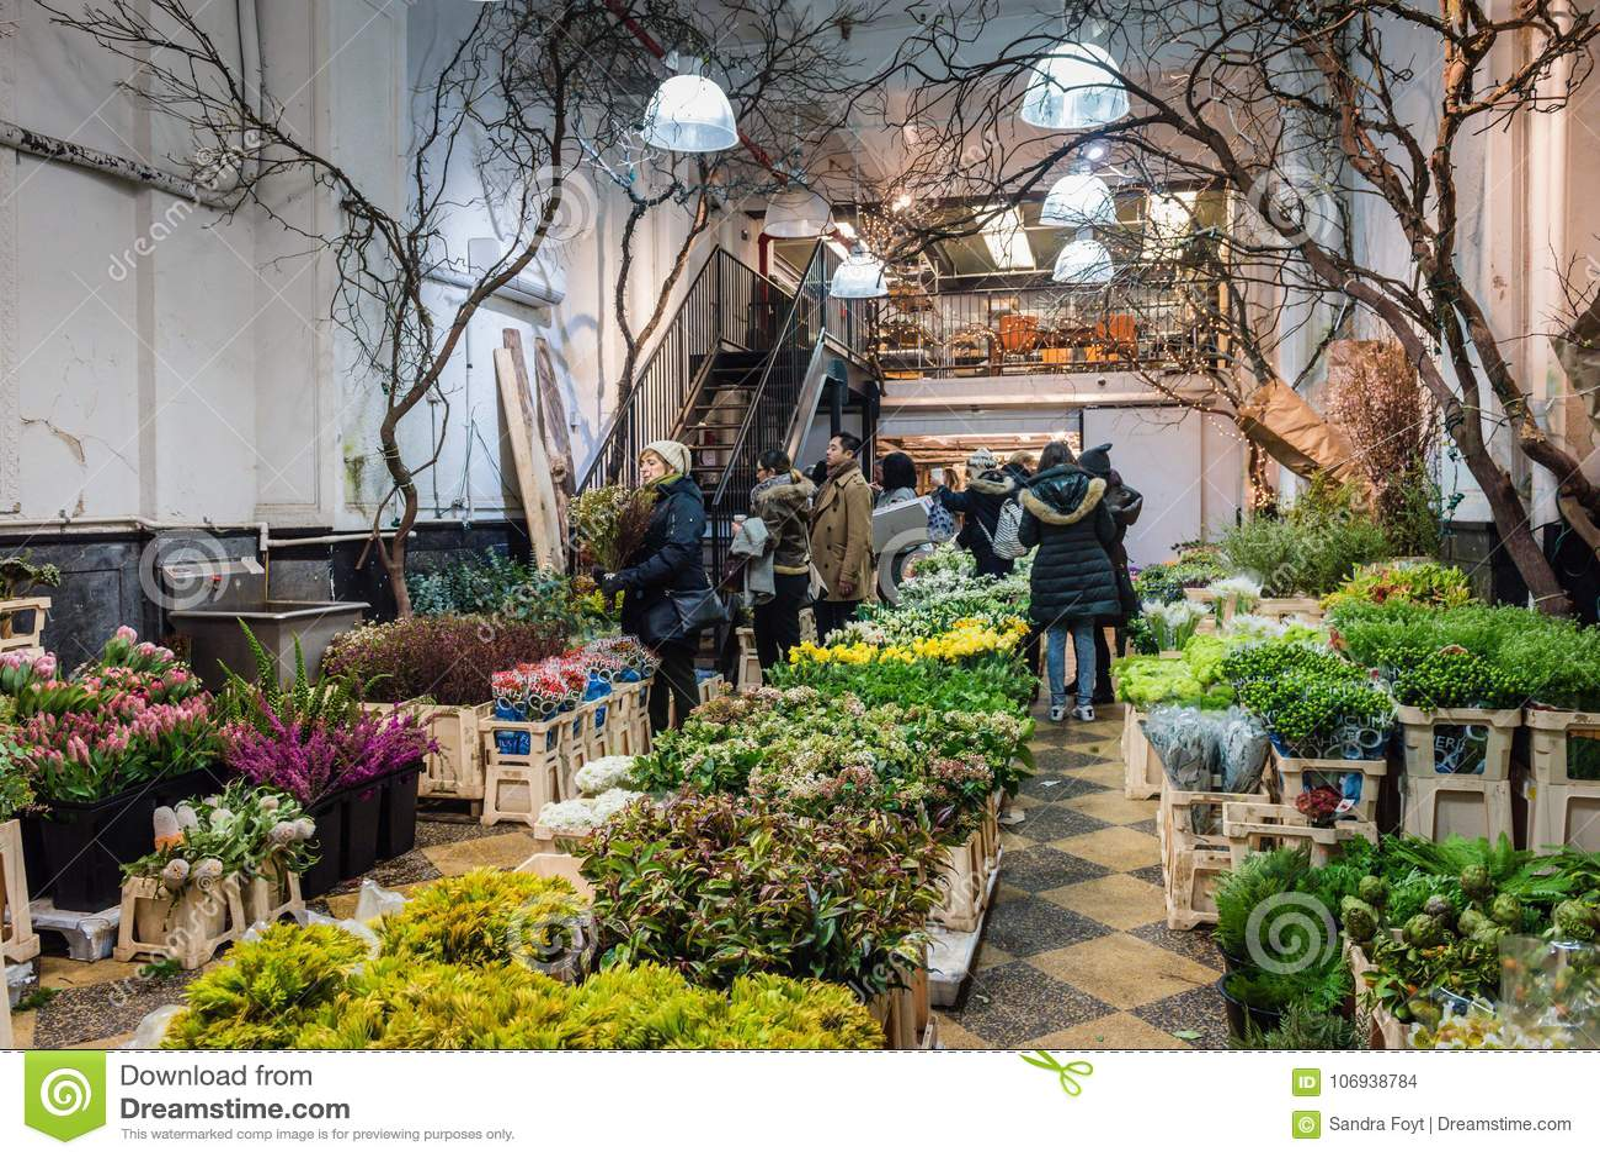 innerhalb eines shops in chelsea flower market - new york city